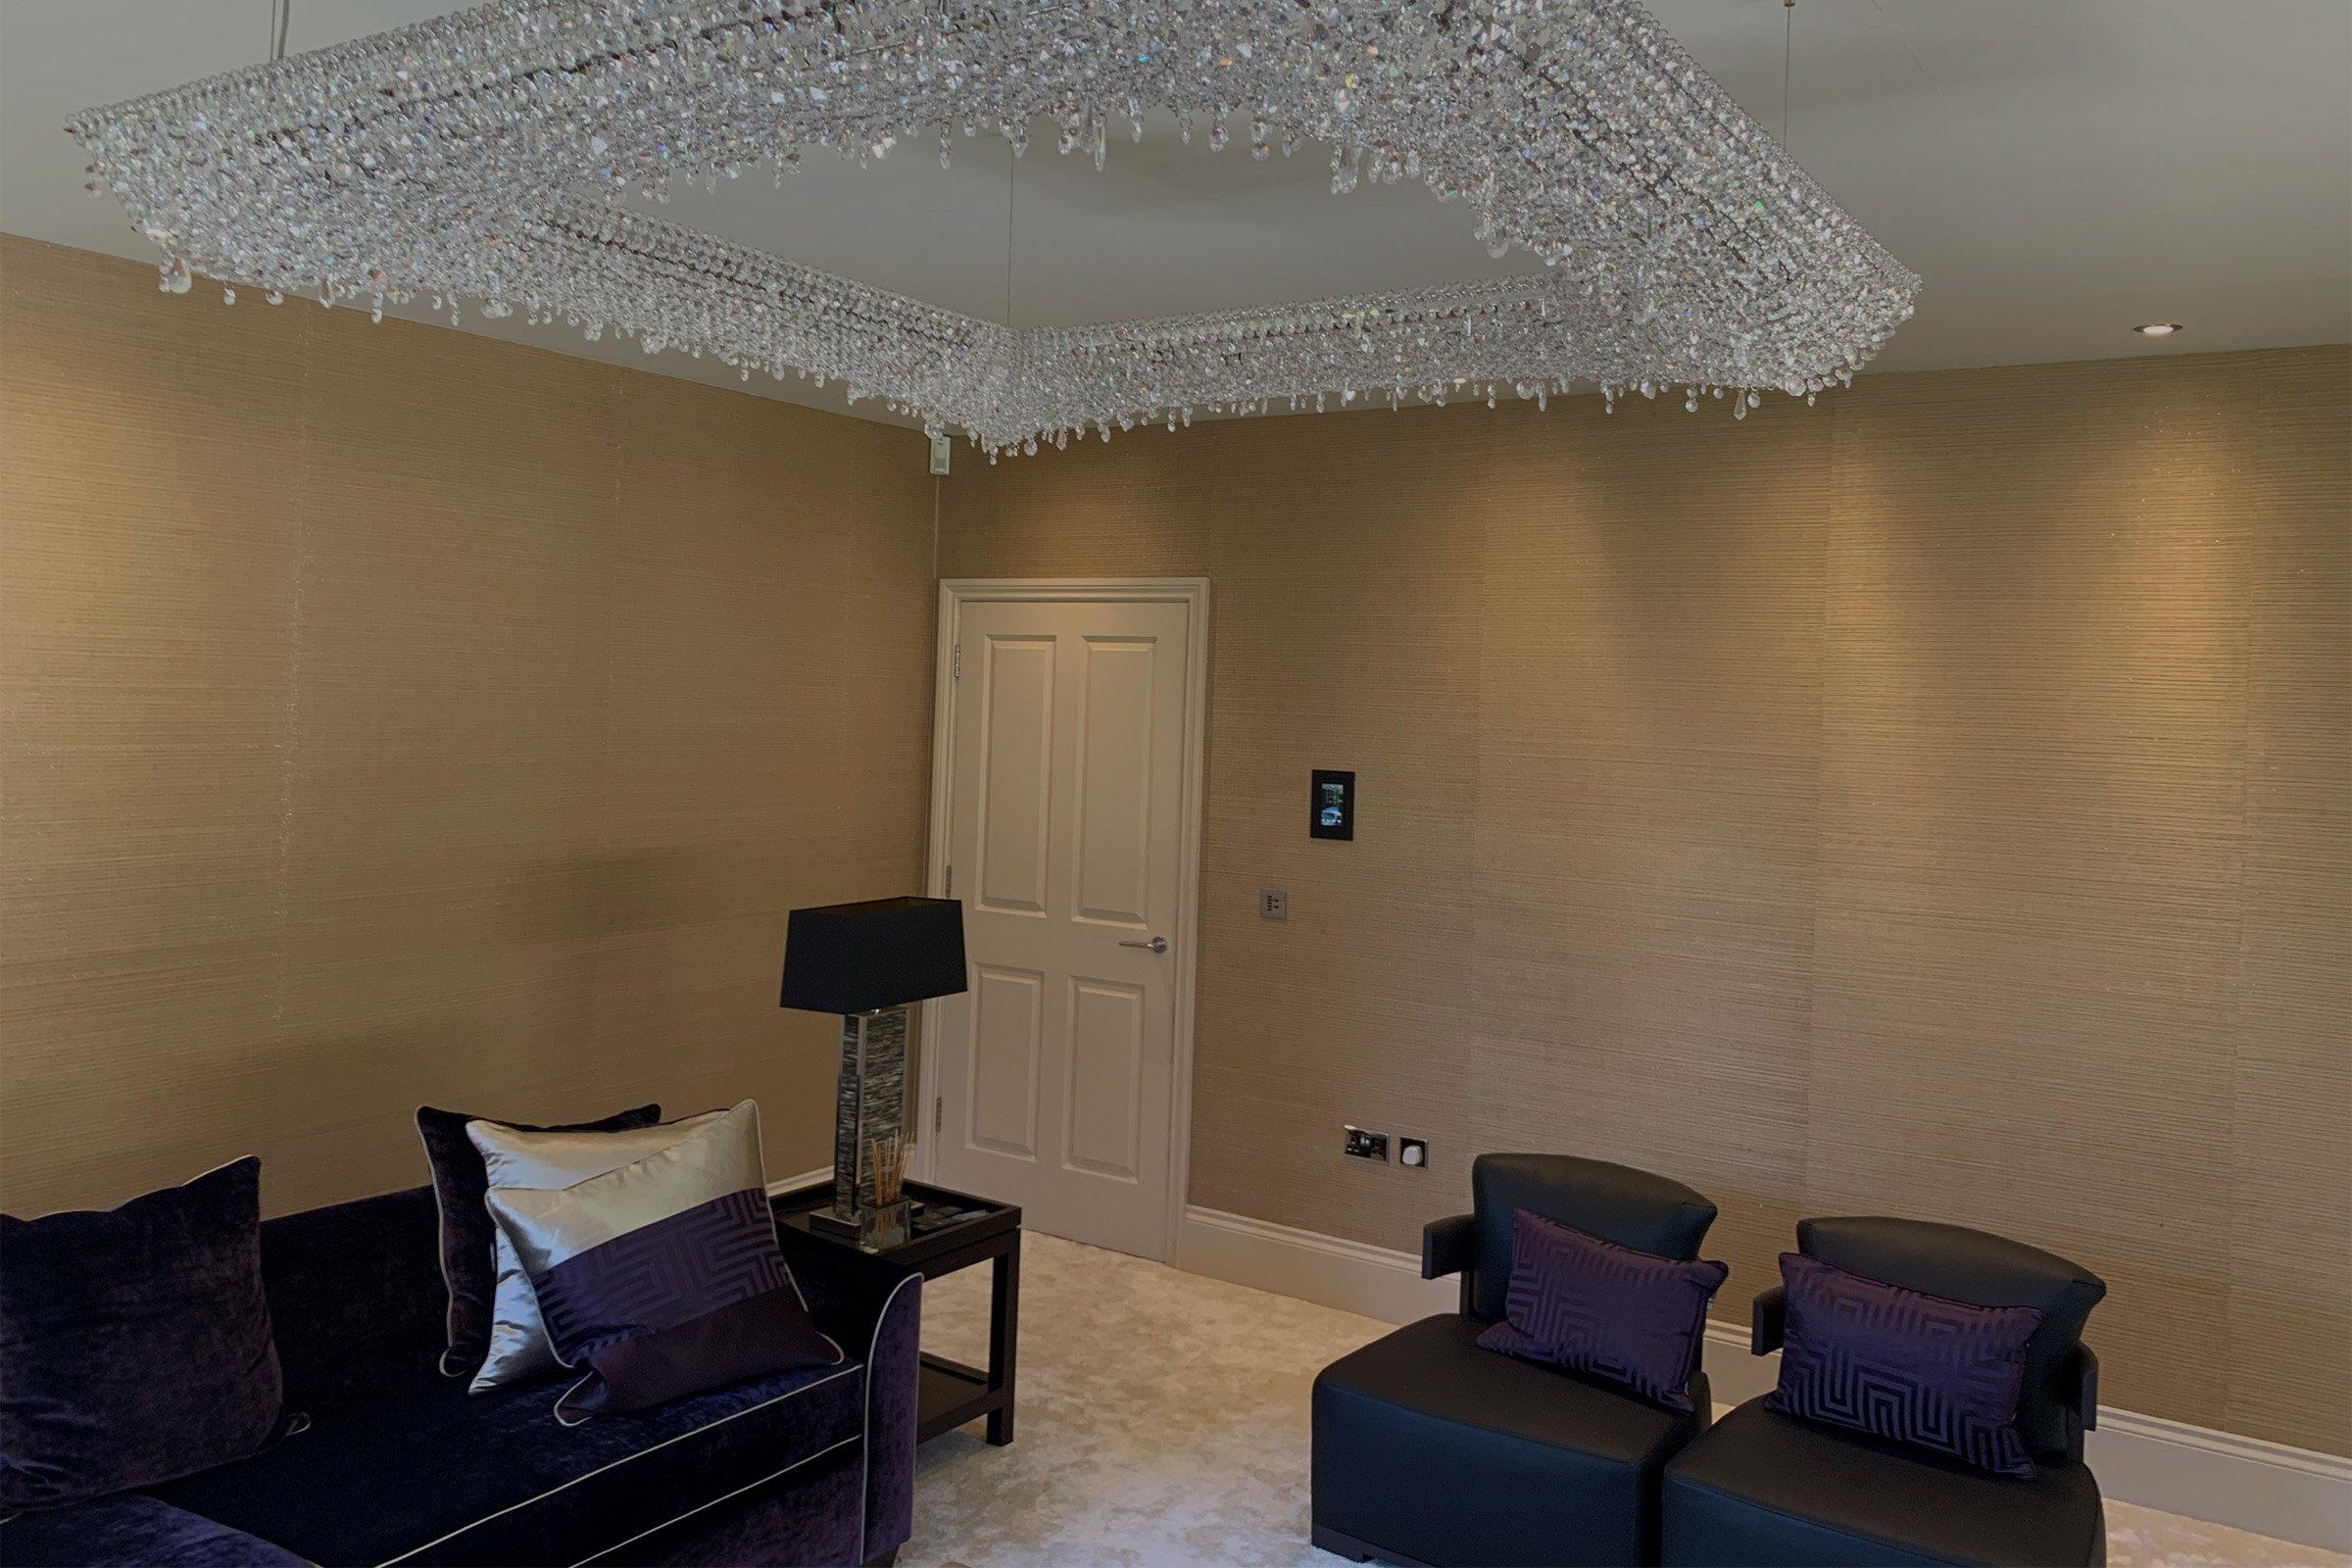 Formal living room with Lutron lighting and Savant control